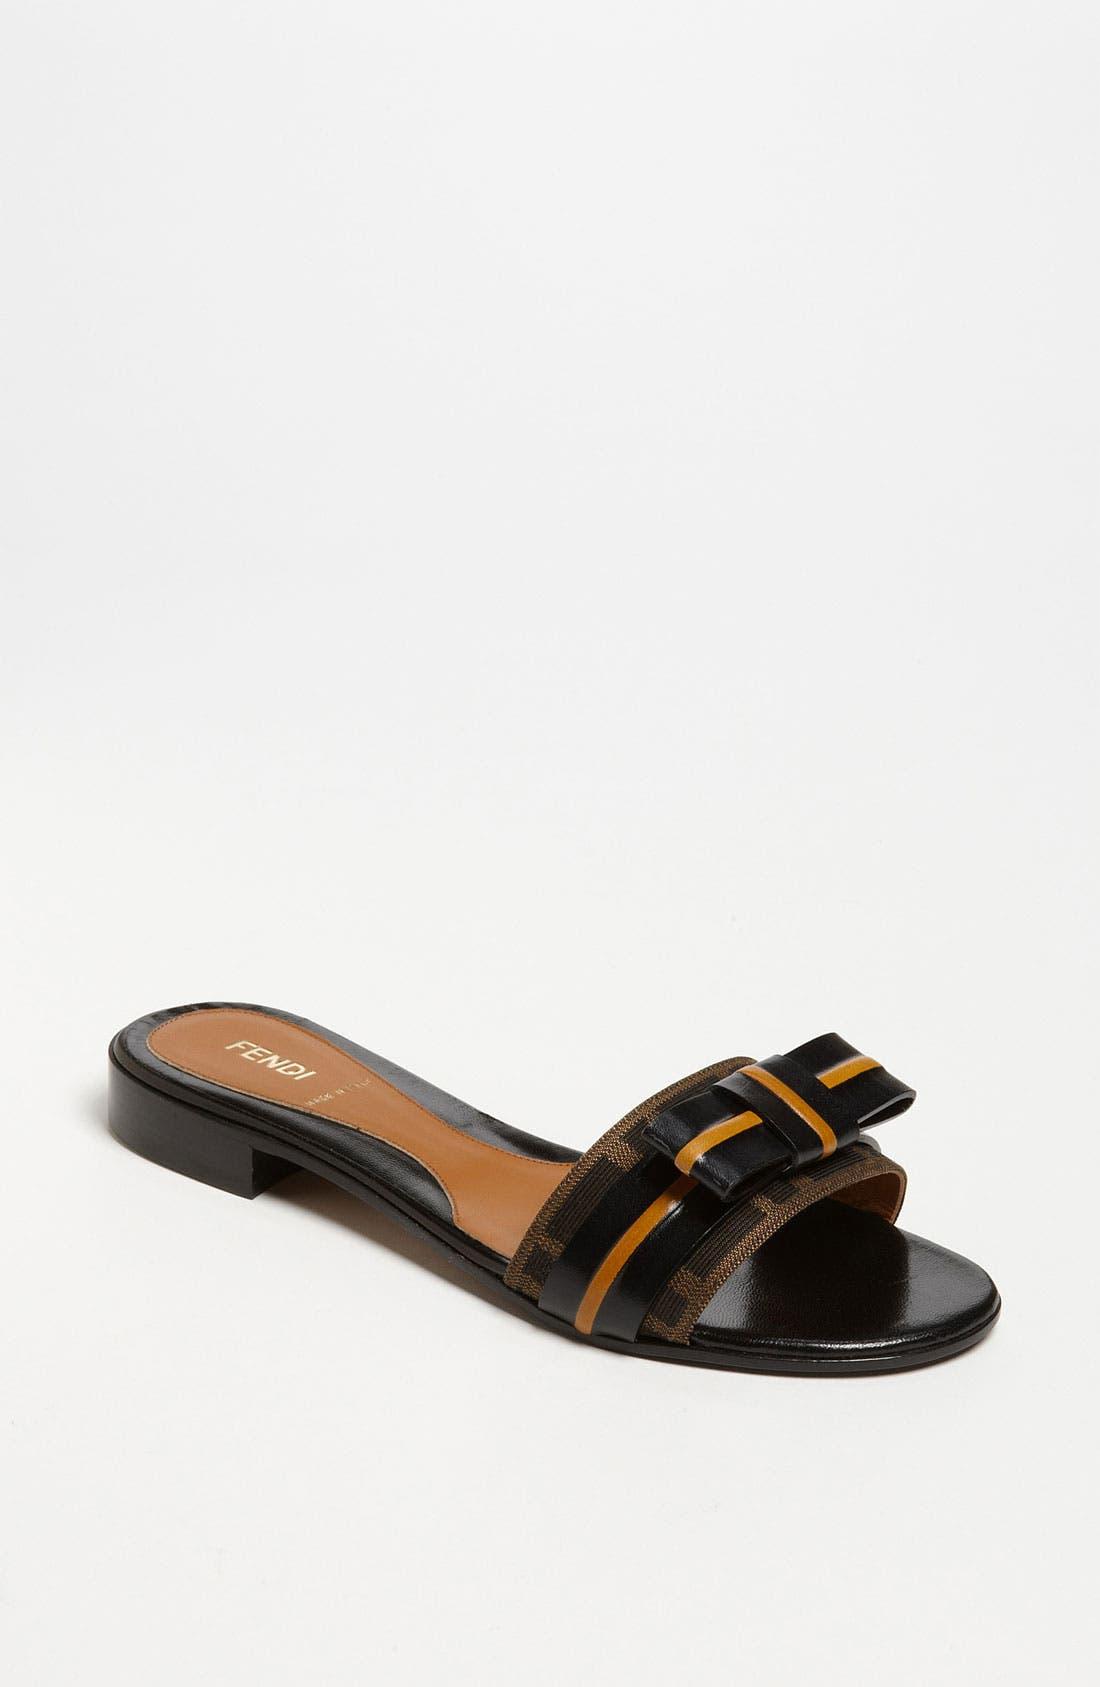 Alternate Image 1 Selected - Fendi 'Pride & Prejudice' Bow Slide Sandal